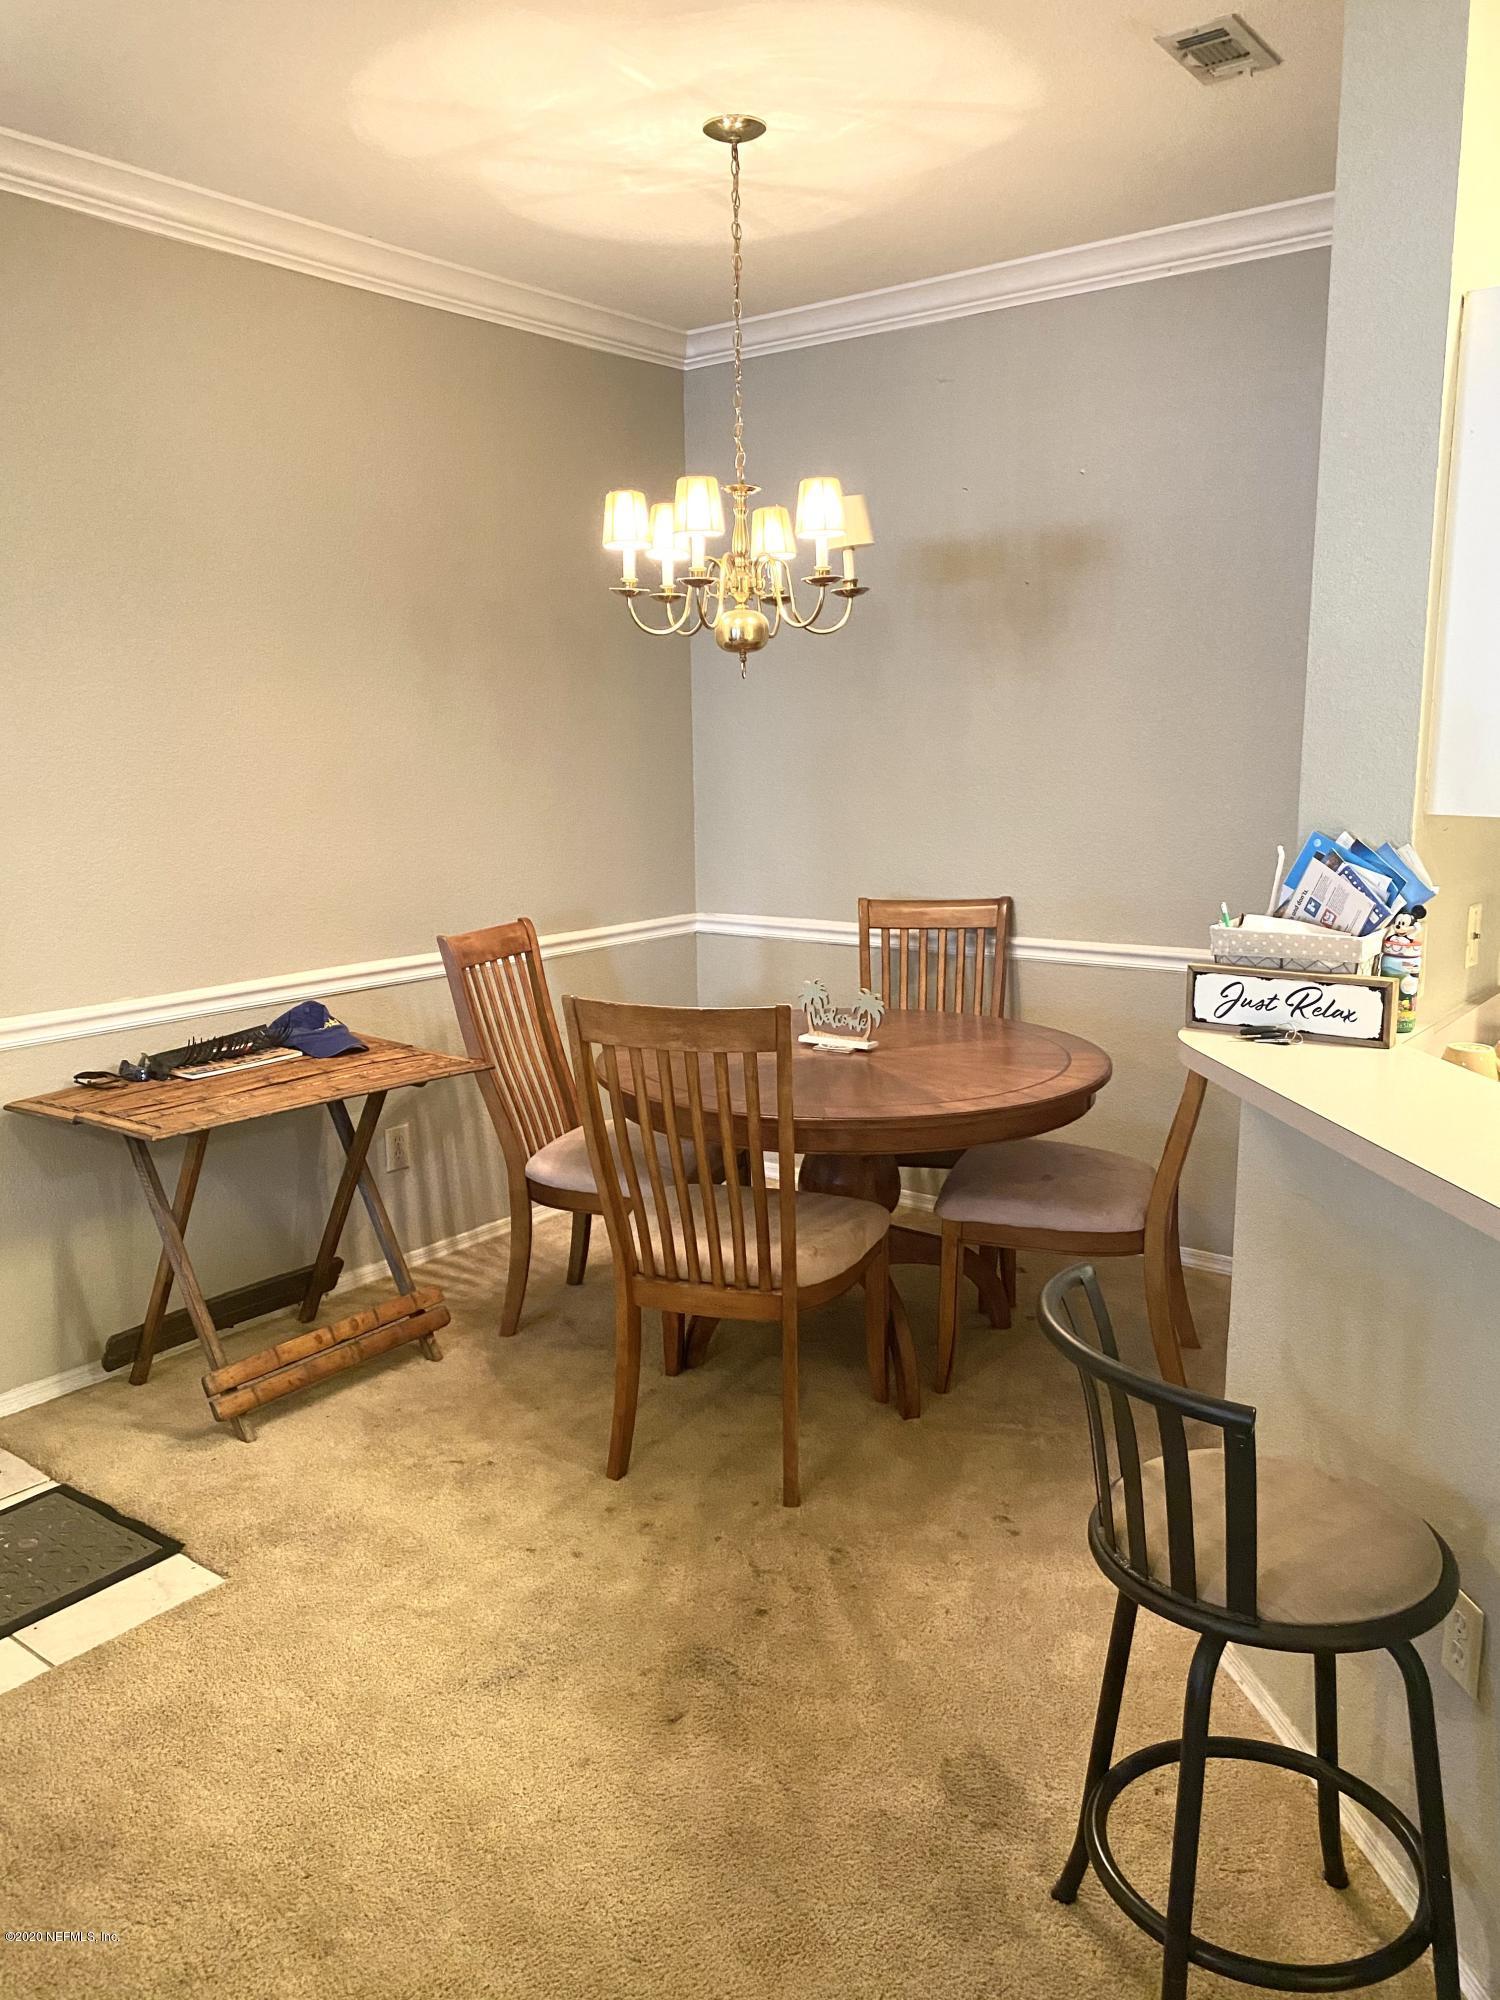 13810 SUTTON PARK, JACKSONVILLE, FLORIDA 32224, 2 Bedrooms Bedrooms, ,2 BathroomsBathrooms,Residential,For sale,SUTTON PARK,1080286